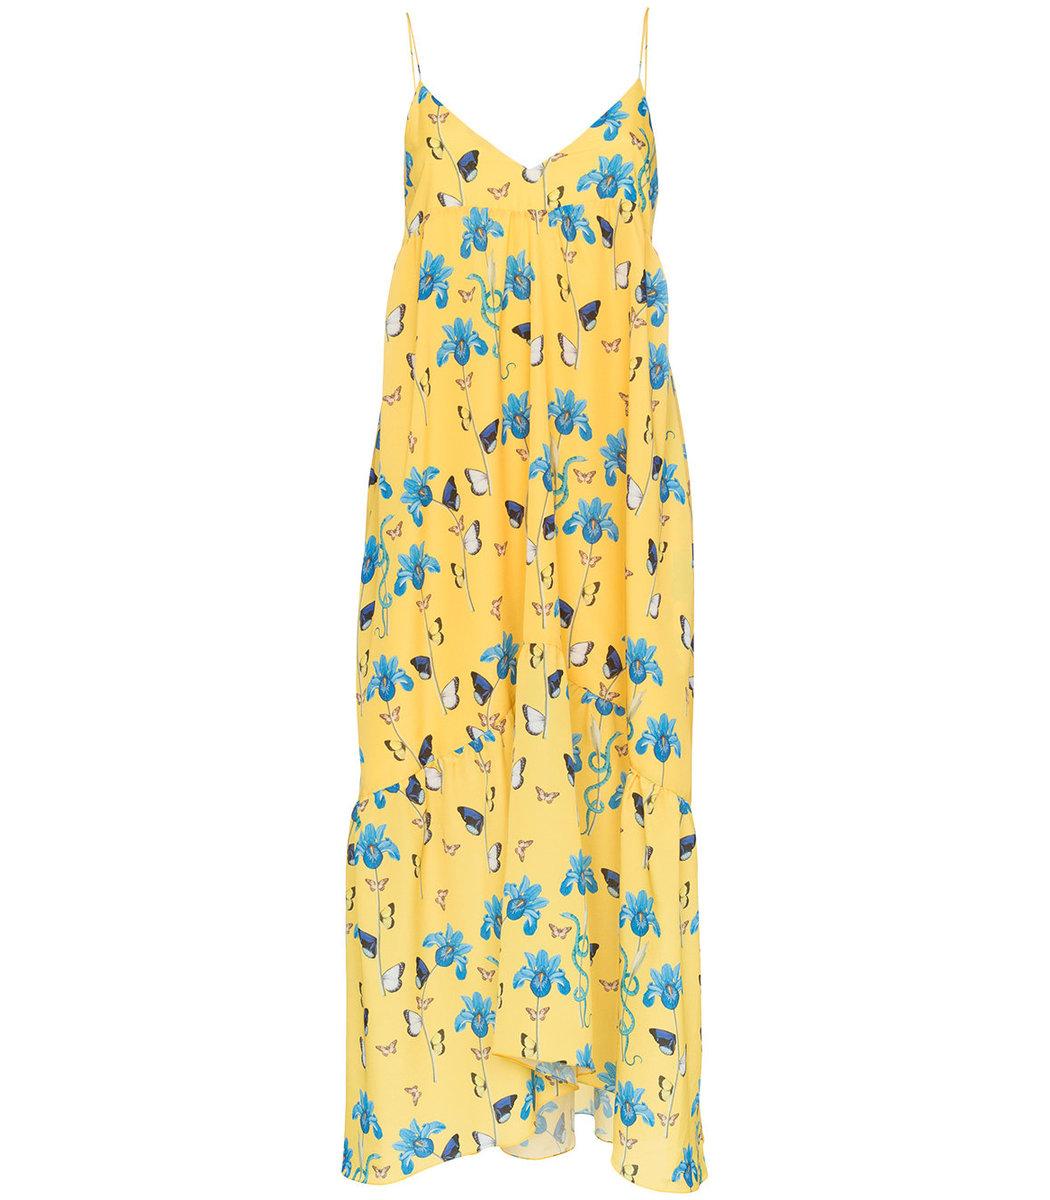 Borgo De Nor Anais Floral Print Dress